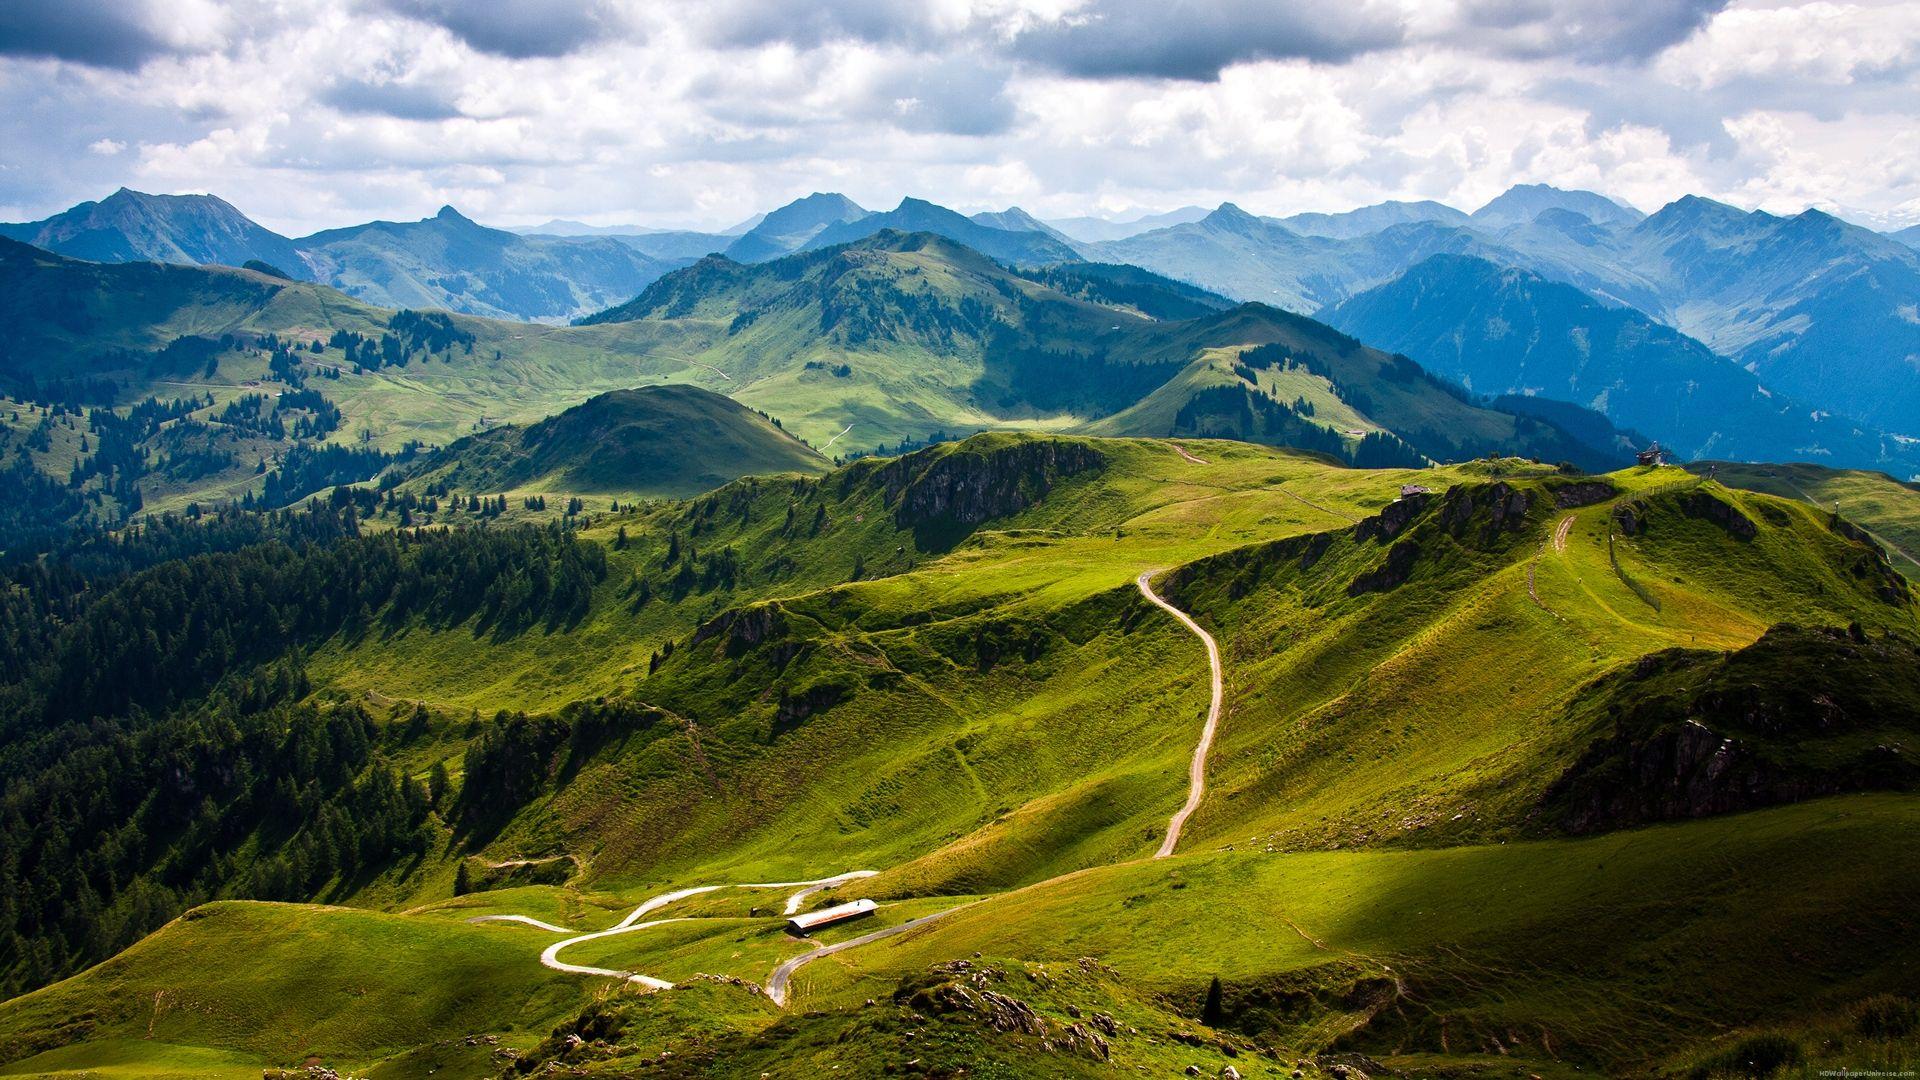 Austria mountains beautiful road HD Wallpaper - http://www.hdwallpaperuniverse.com/austria-mountains-beautiful-road-hd-wallpaper/